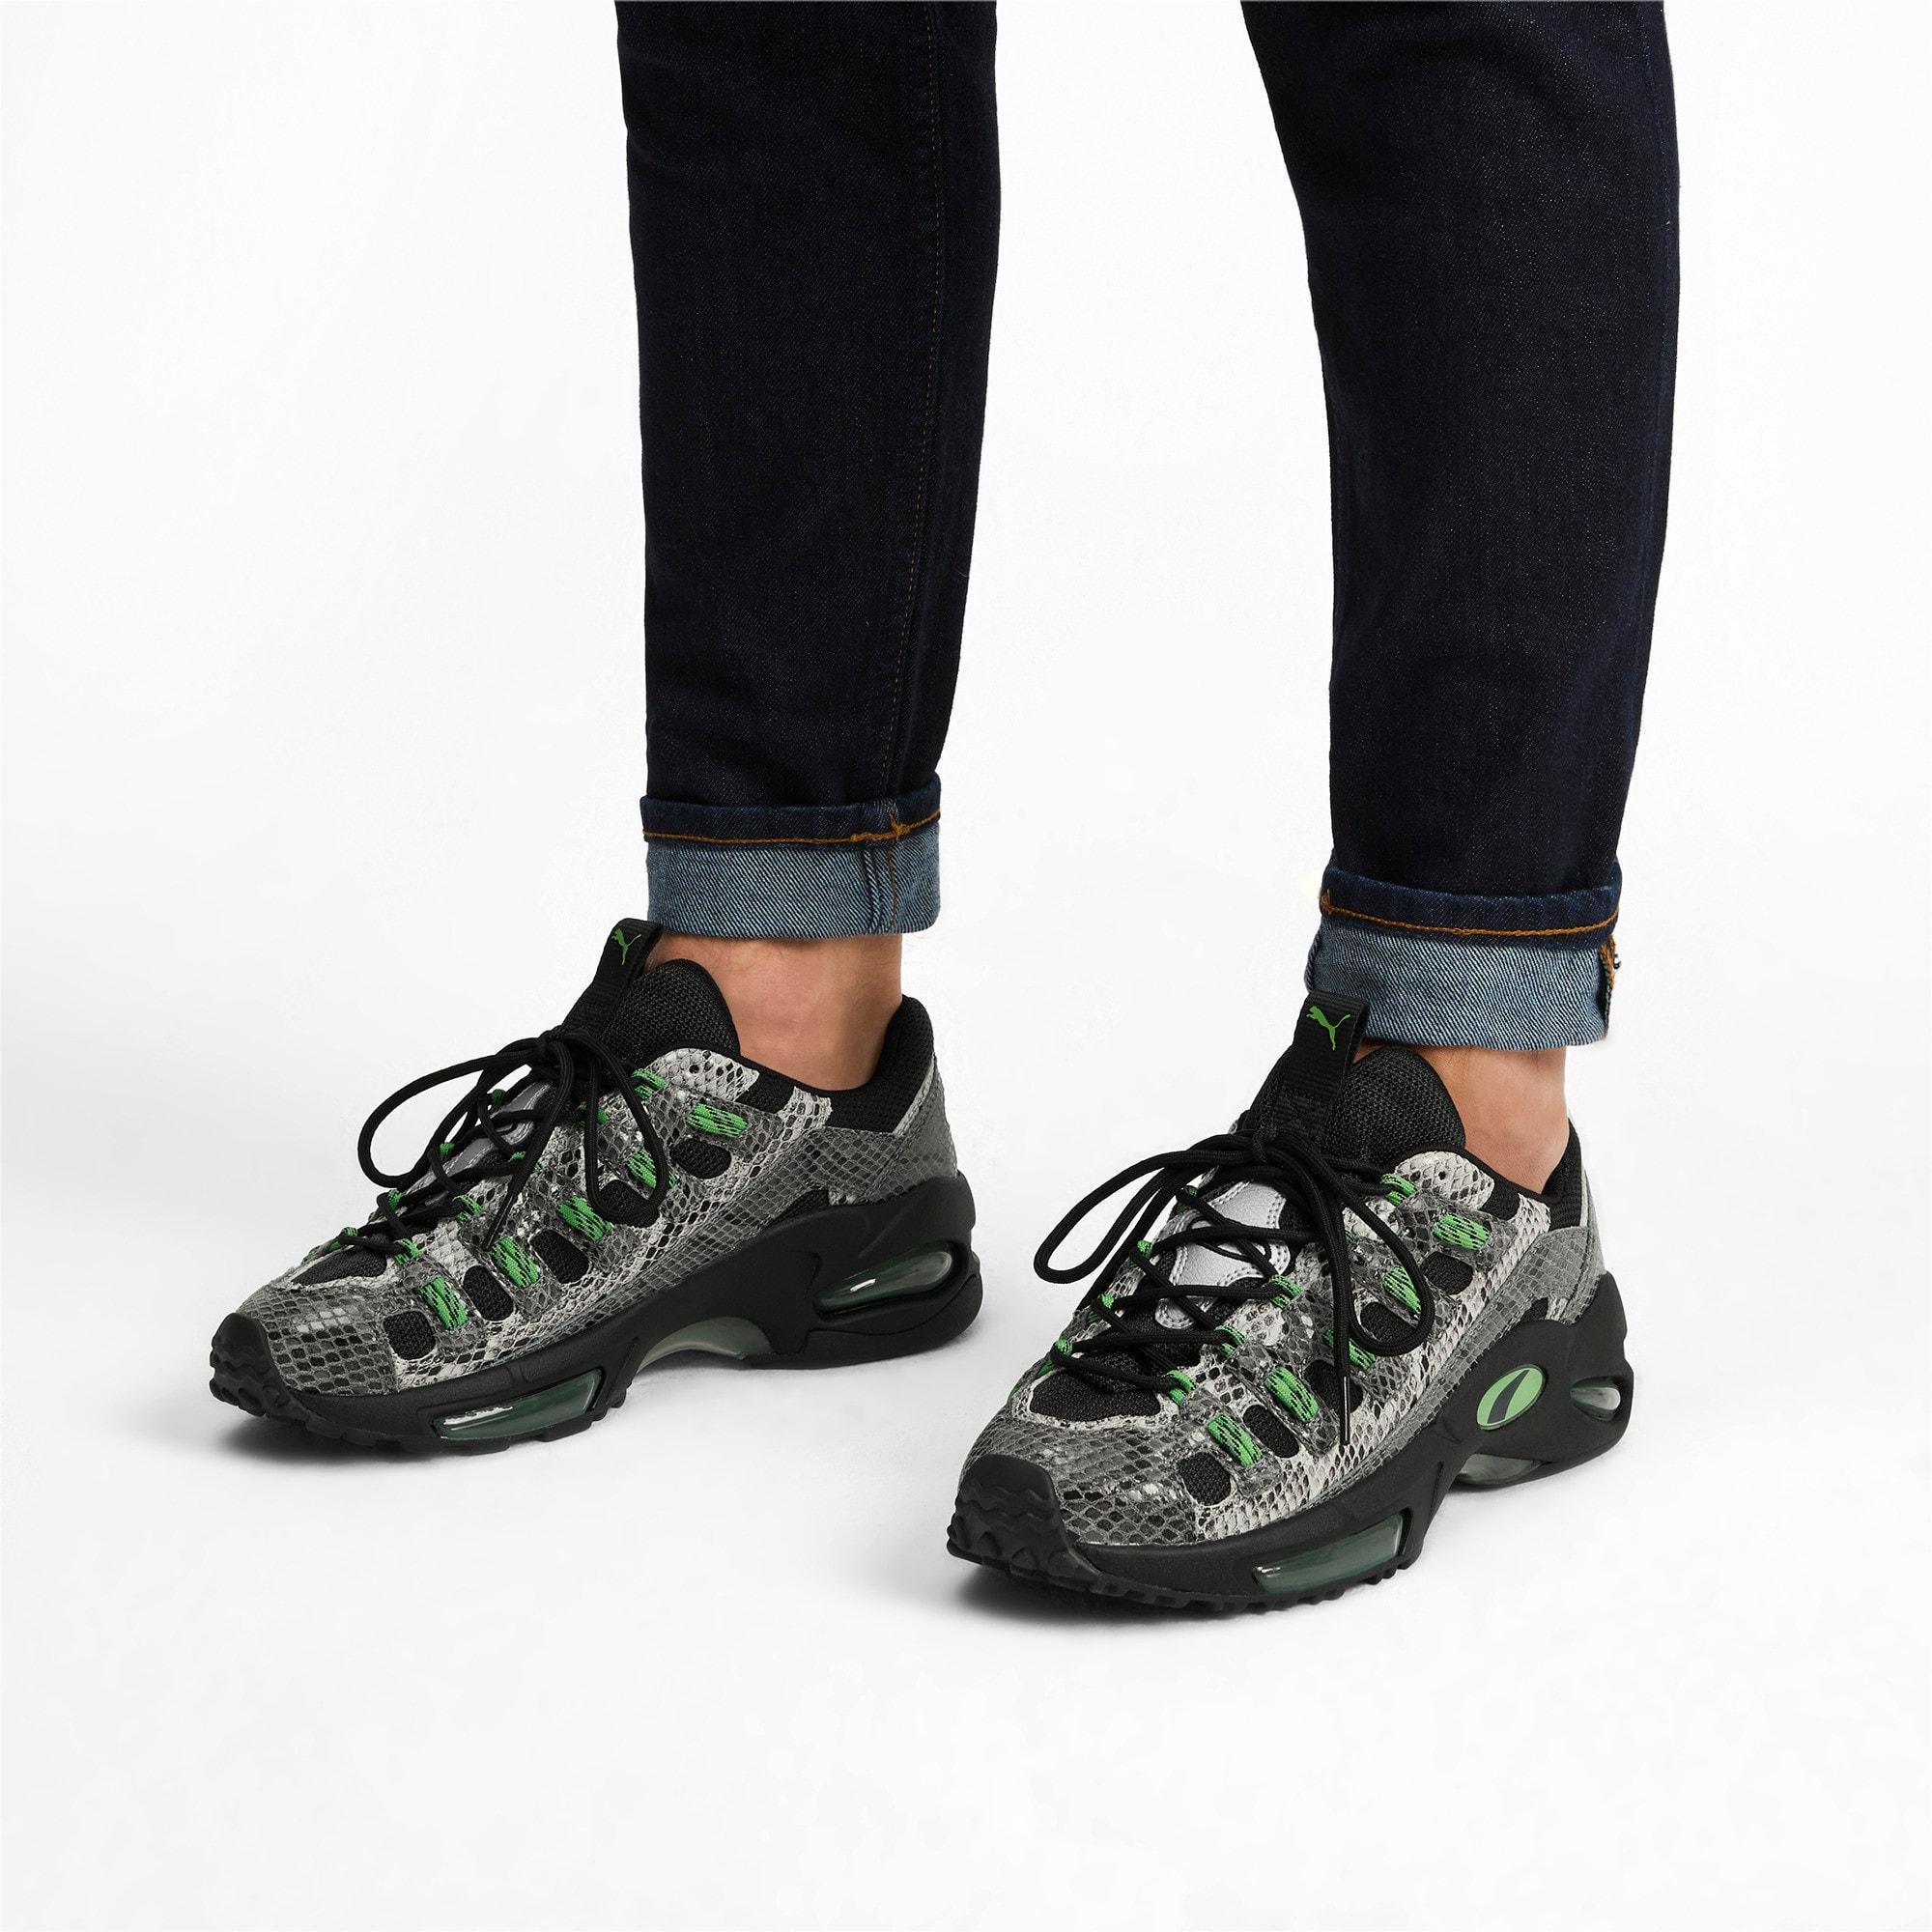 Thumbnail 2 of CELL Endura Animal Kingdom Sneakers, Puma Black-Classic Green, medium